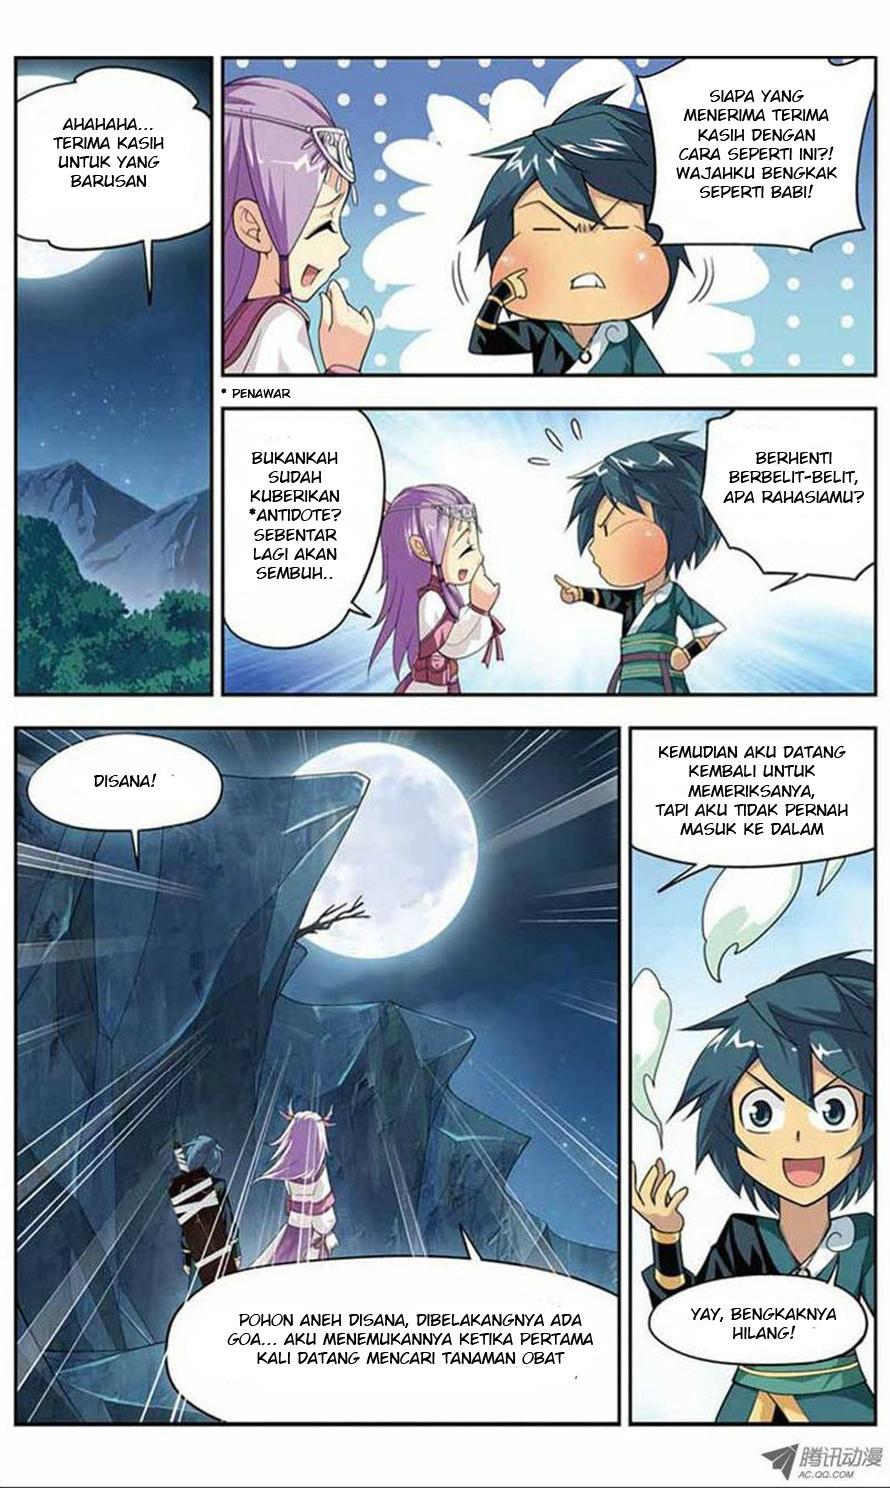 Dilarang COPAS - situs resmi www.mangacanblog.com - Komik battle through heaven 022 - chapter 22 23 Indonesia battle through heaven 022 - chapter 22 Terbaru 20|Baca Manga Komik Indonesia|Mangacan